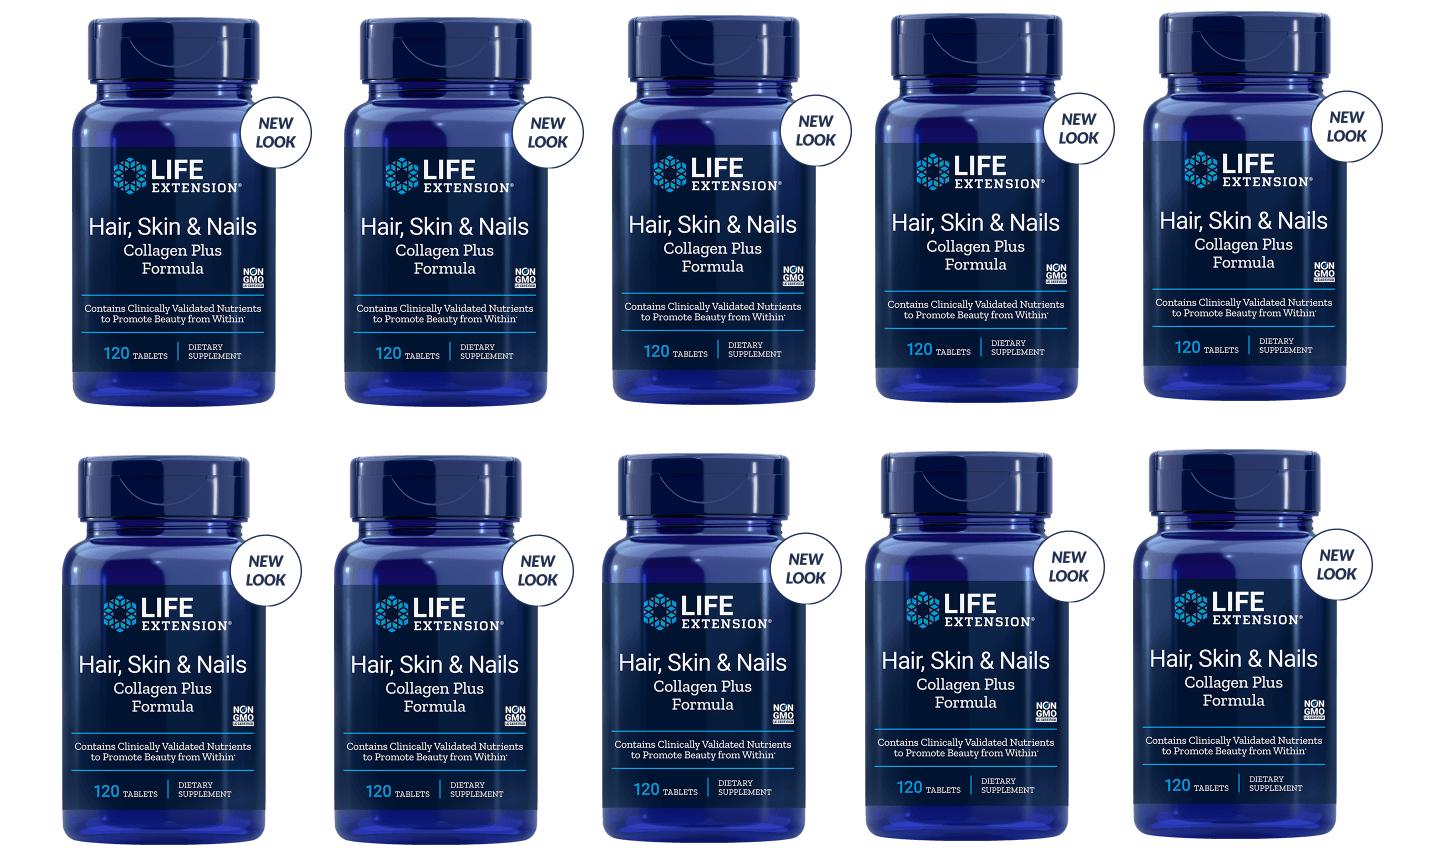 Life Extension Hair, Skin & Nails Collagen Plus Formula, 120 Tablets, 10-packs